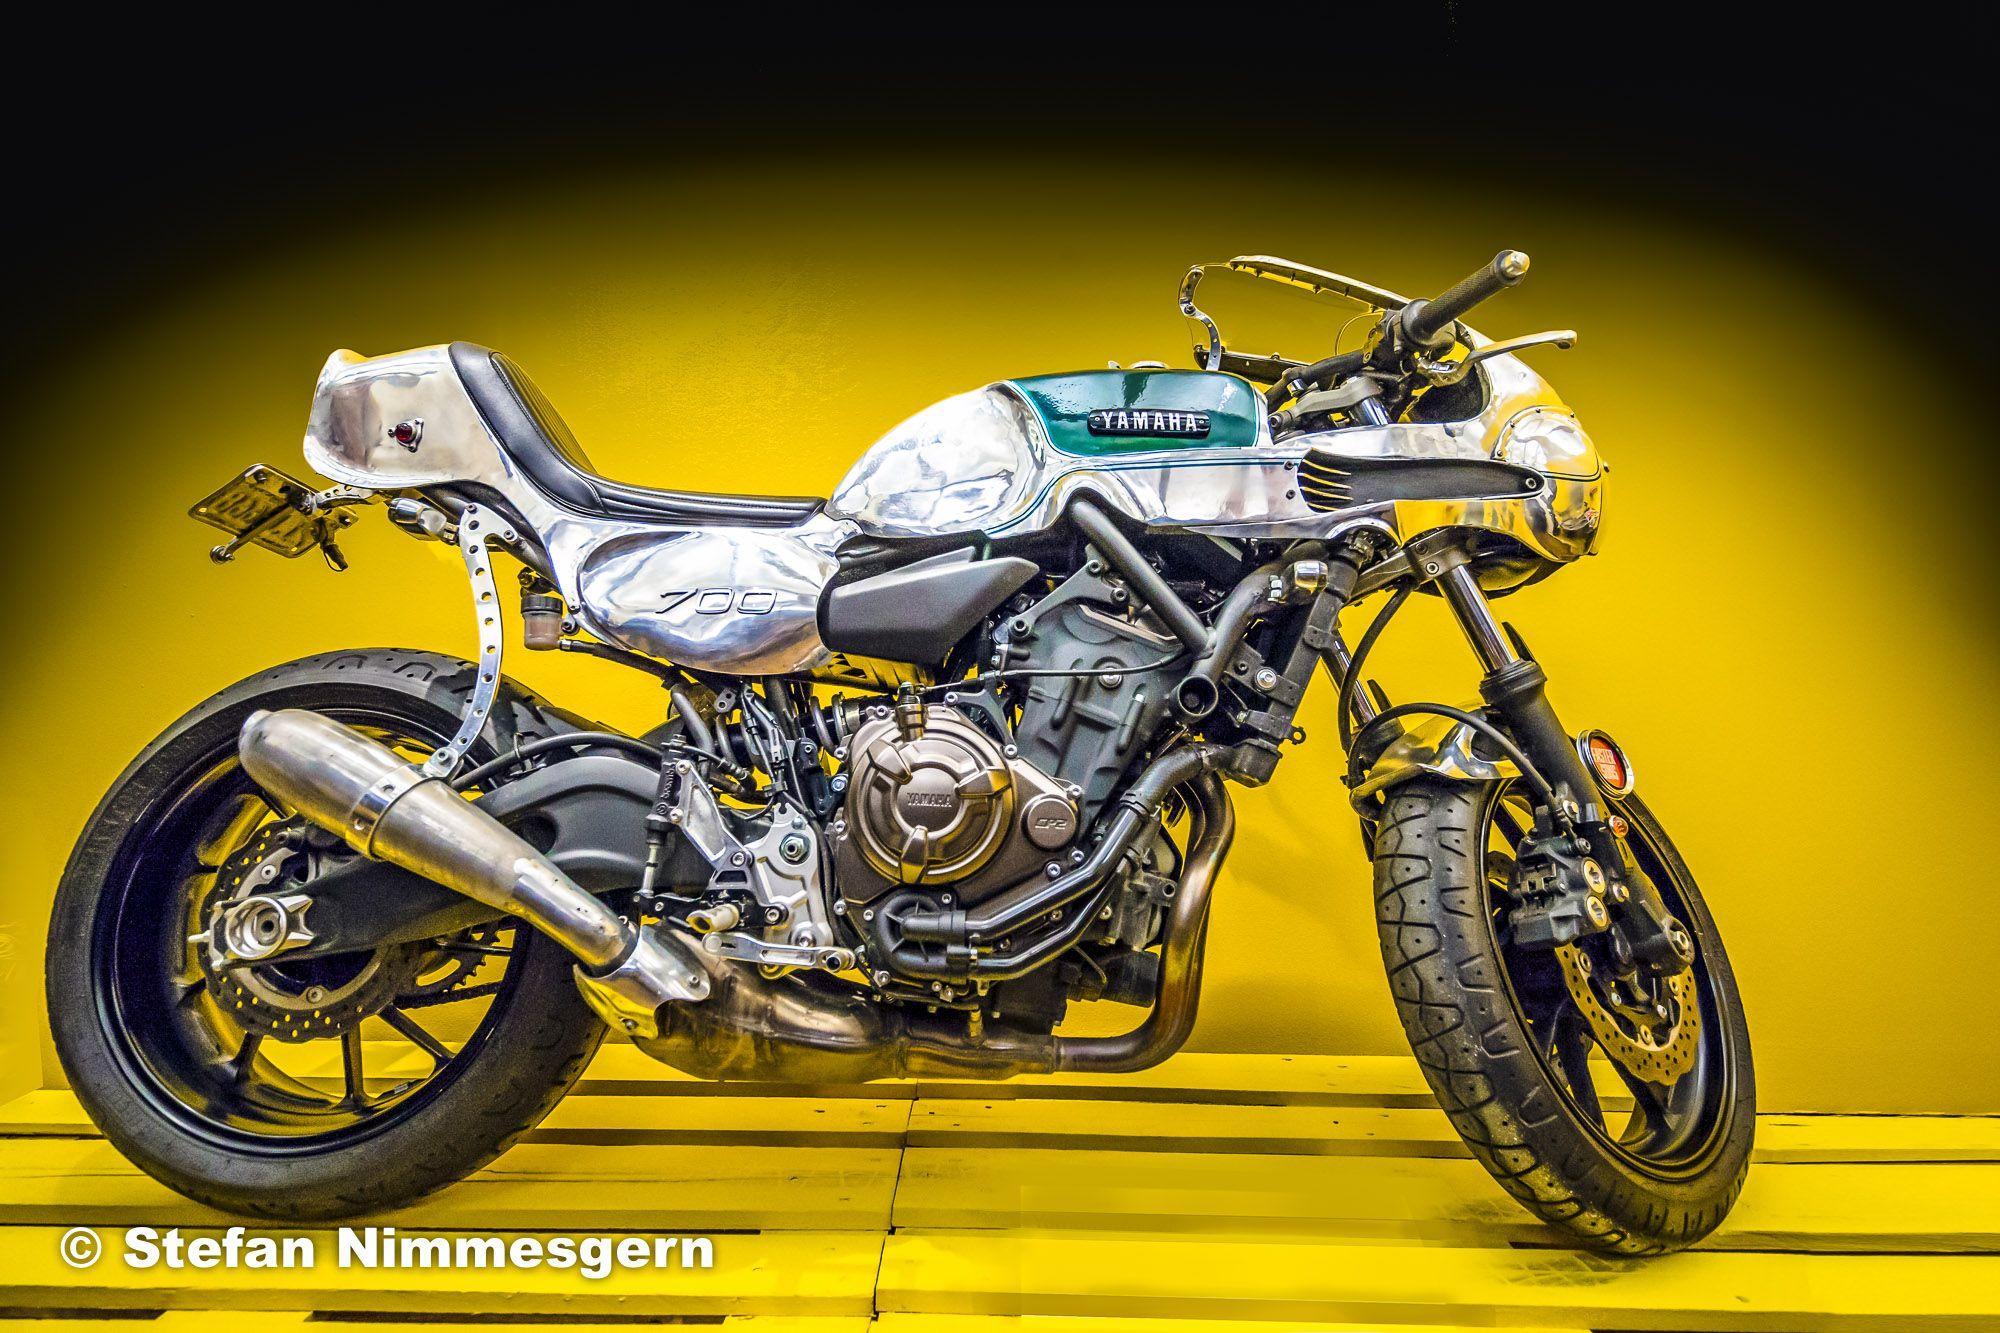 20151009-20151009-Yamaha_L4Q7581